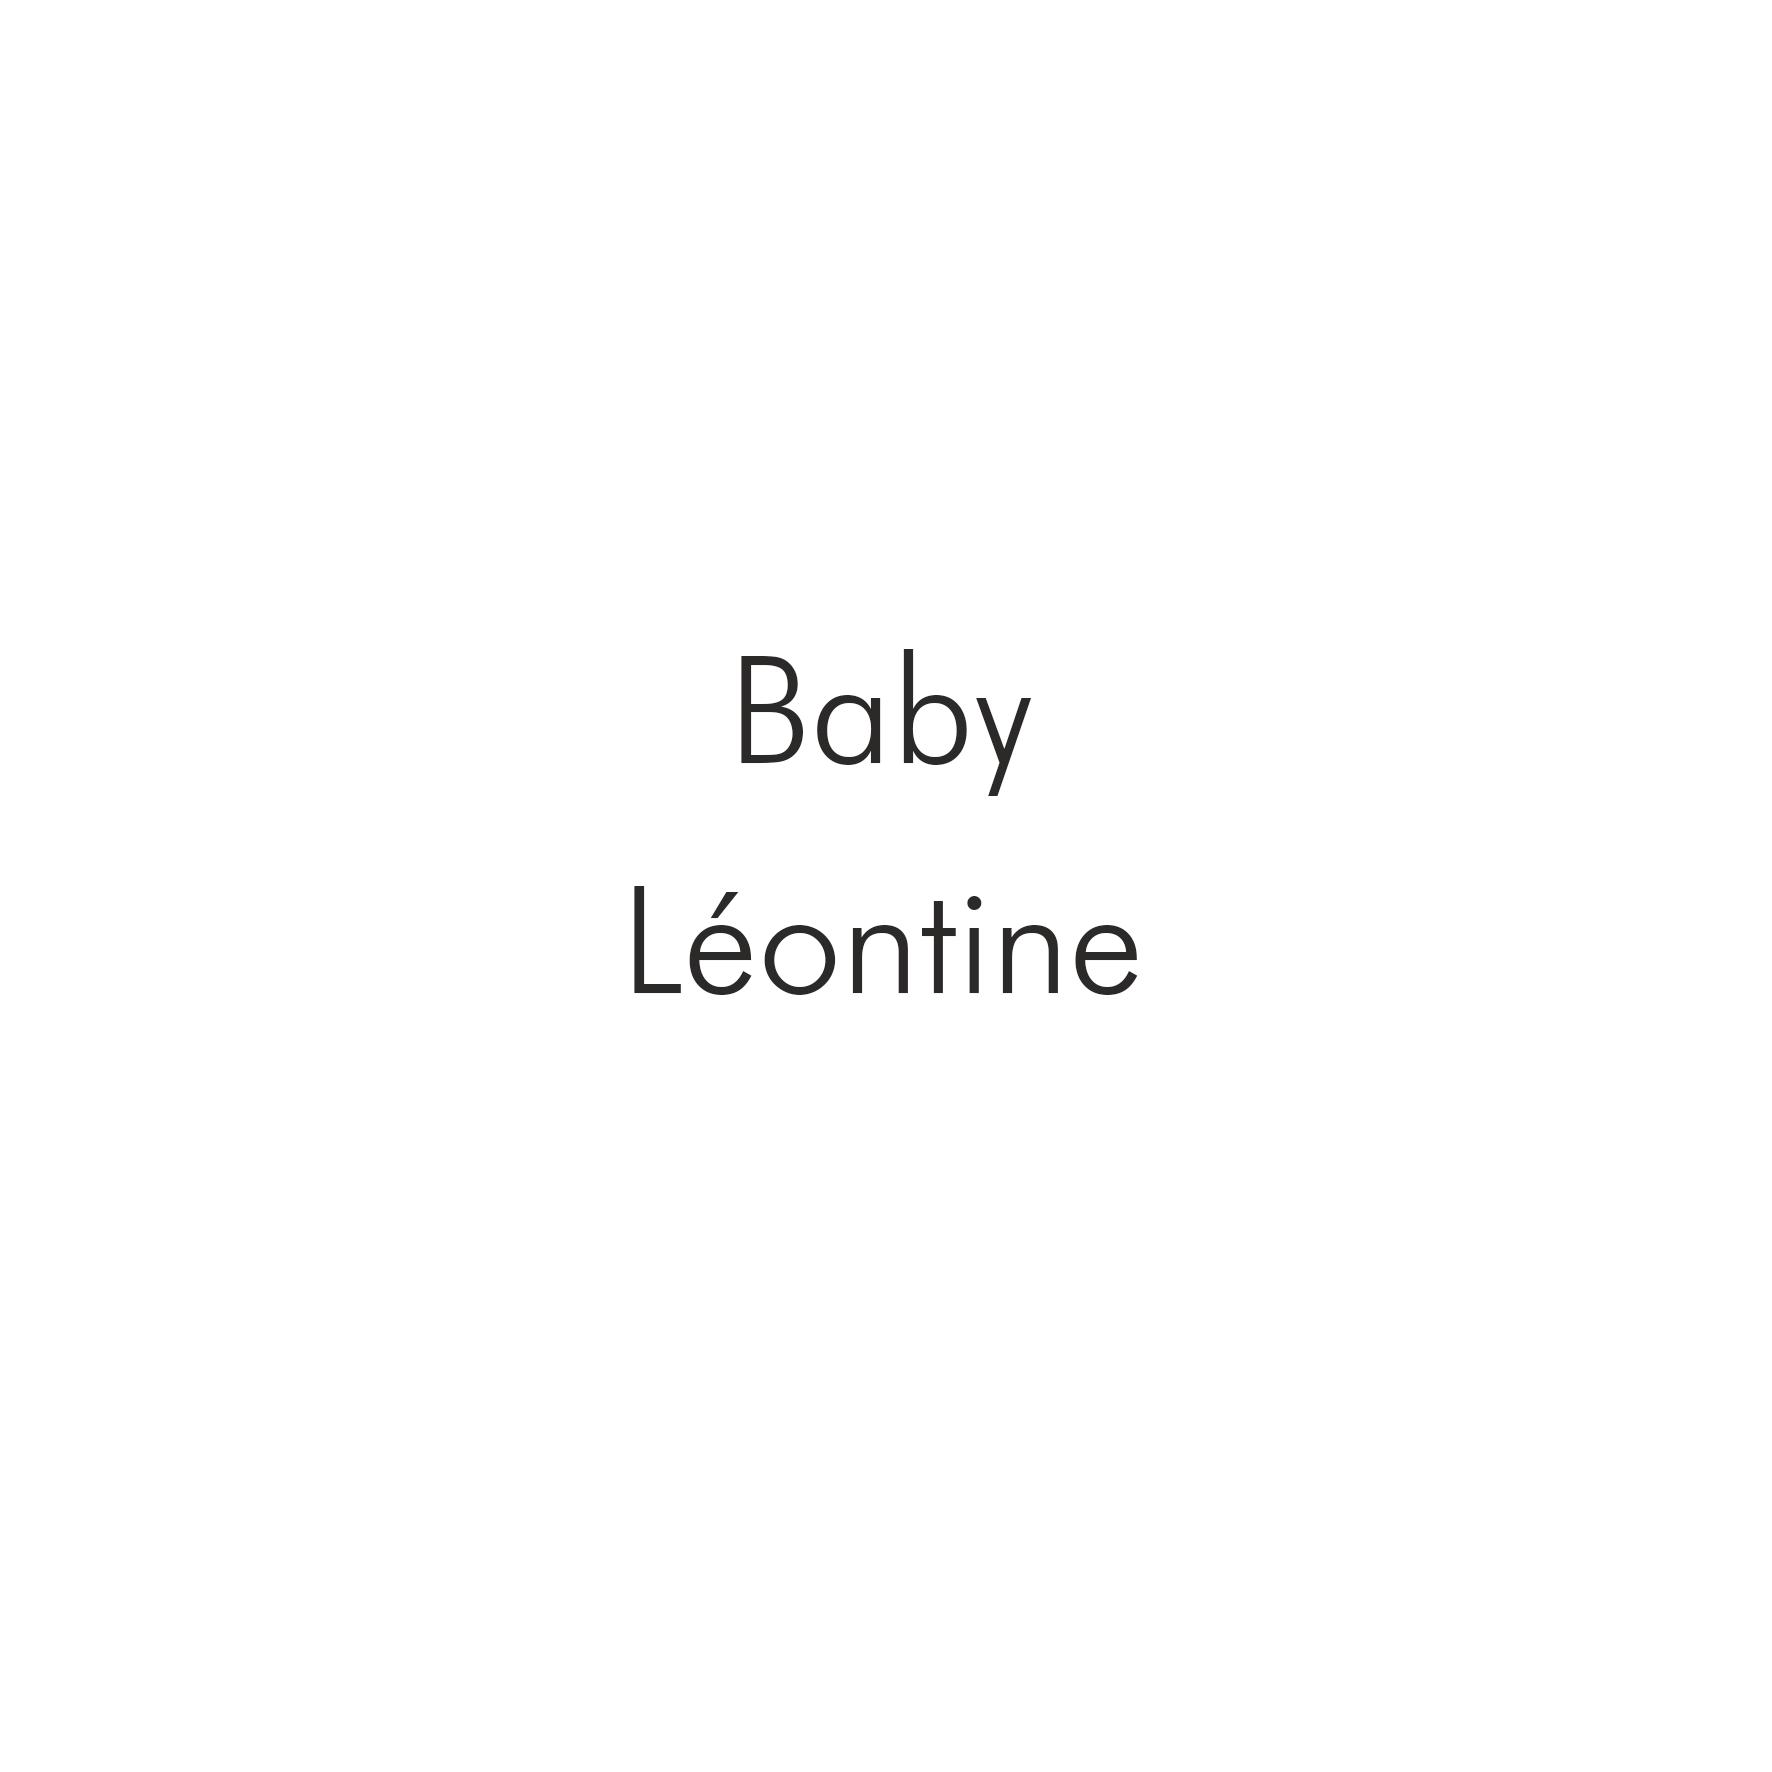 Baby Léontine.png